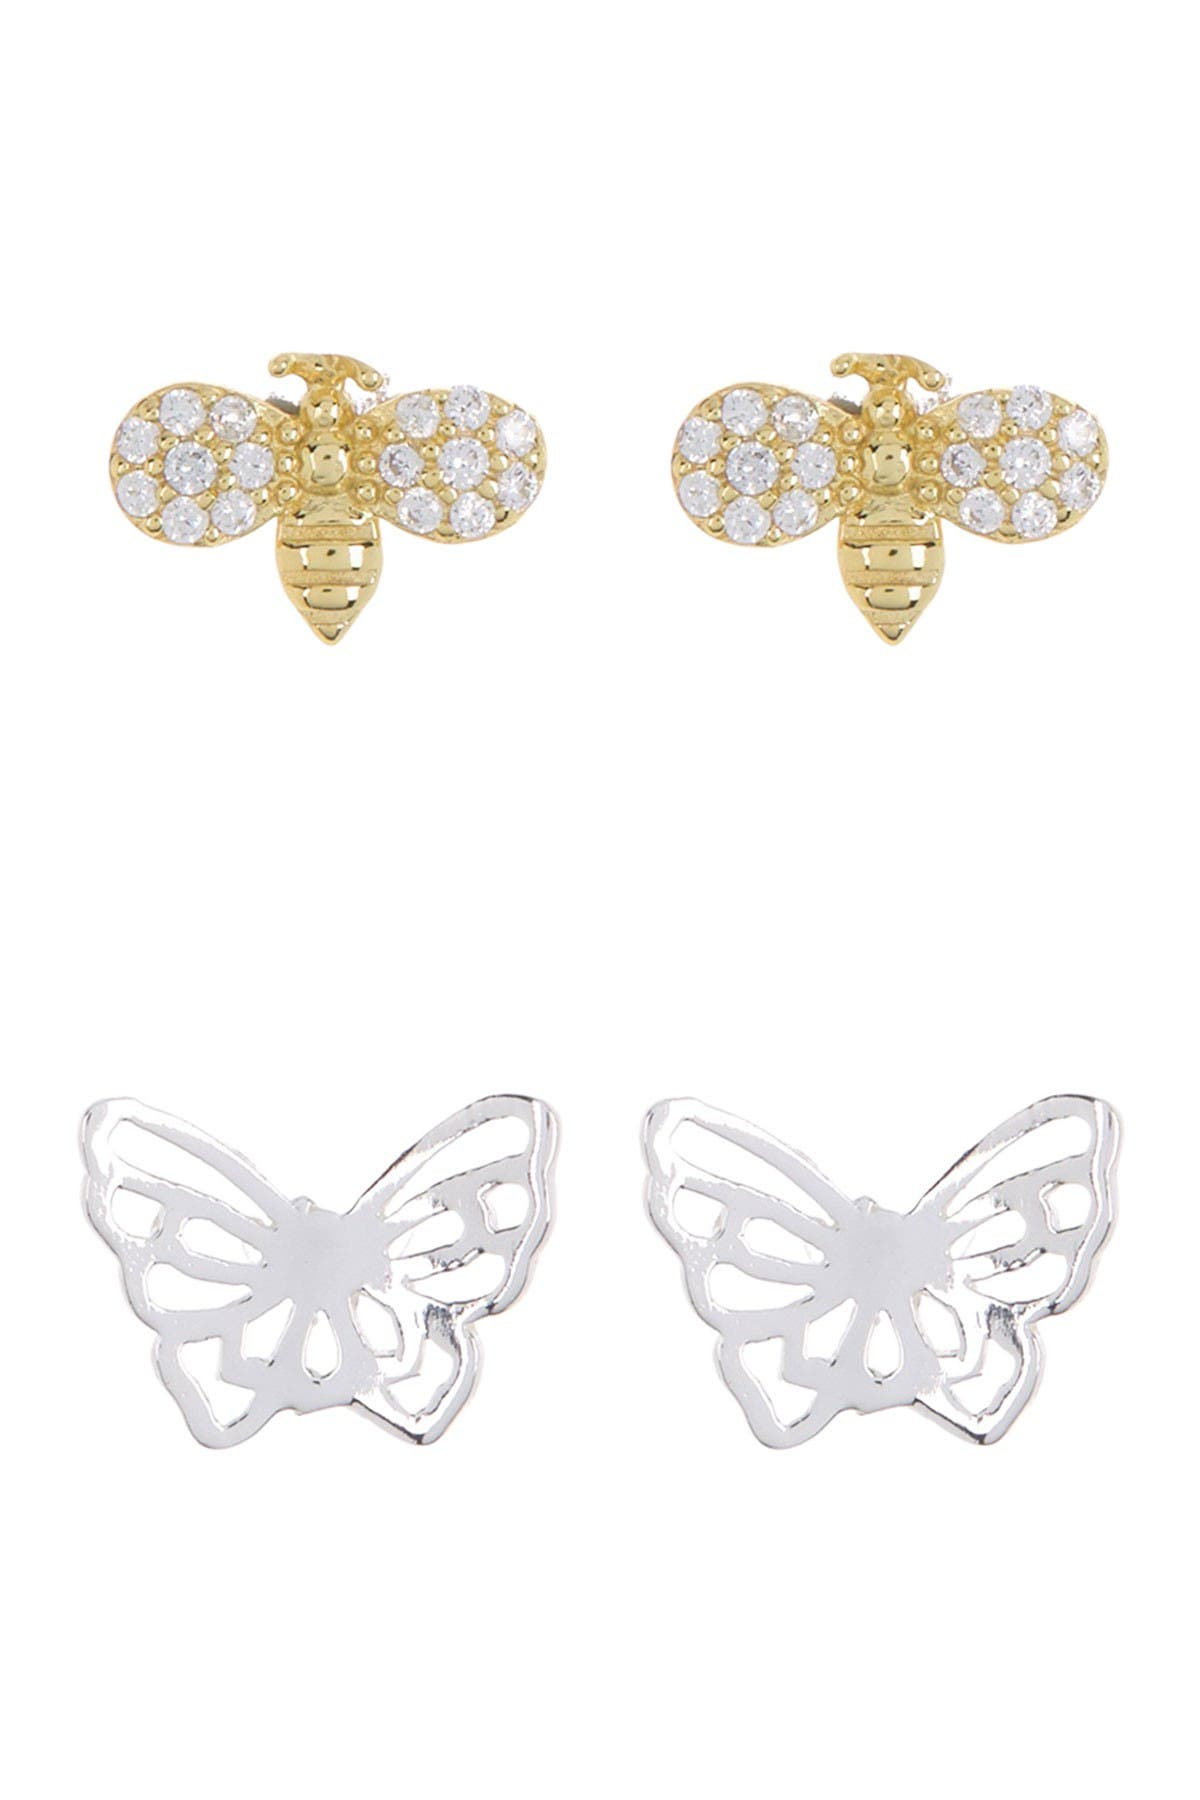 Image of Argento Vivo Two-Tone Bee & Butterfly Stud Earrings Set